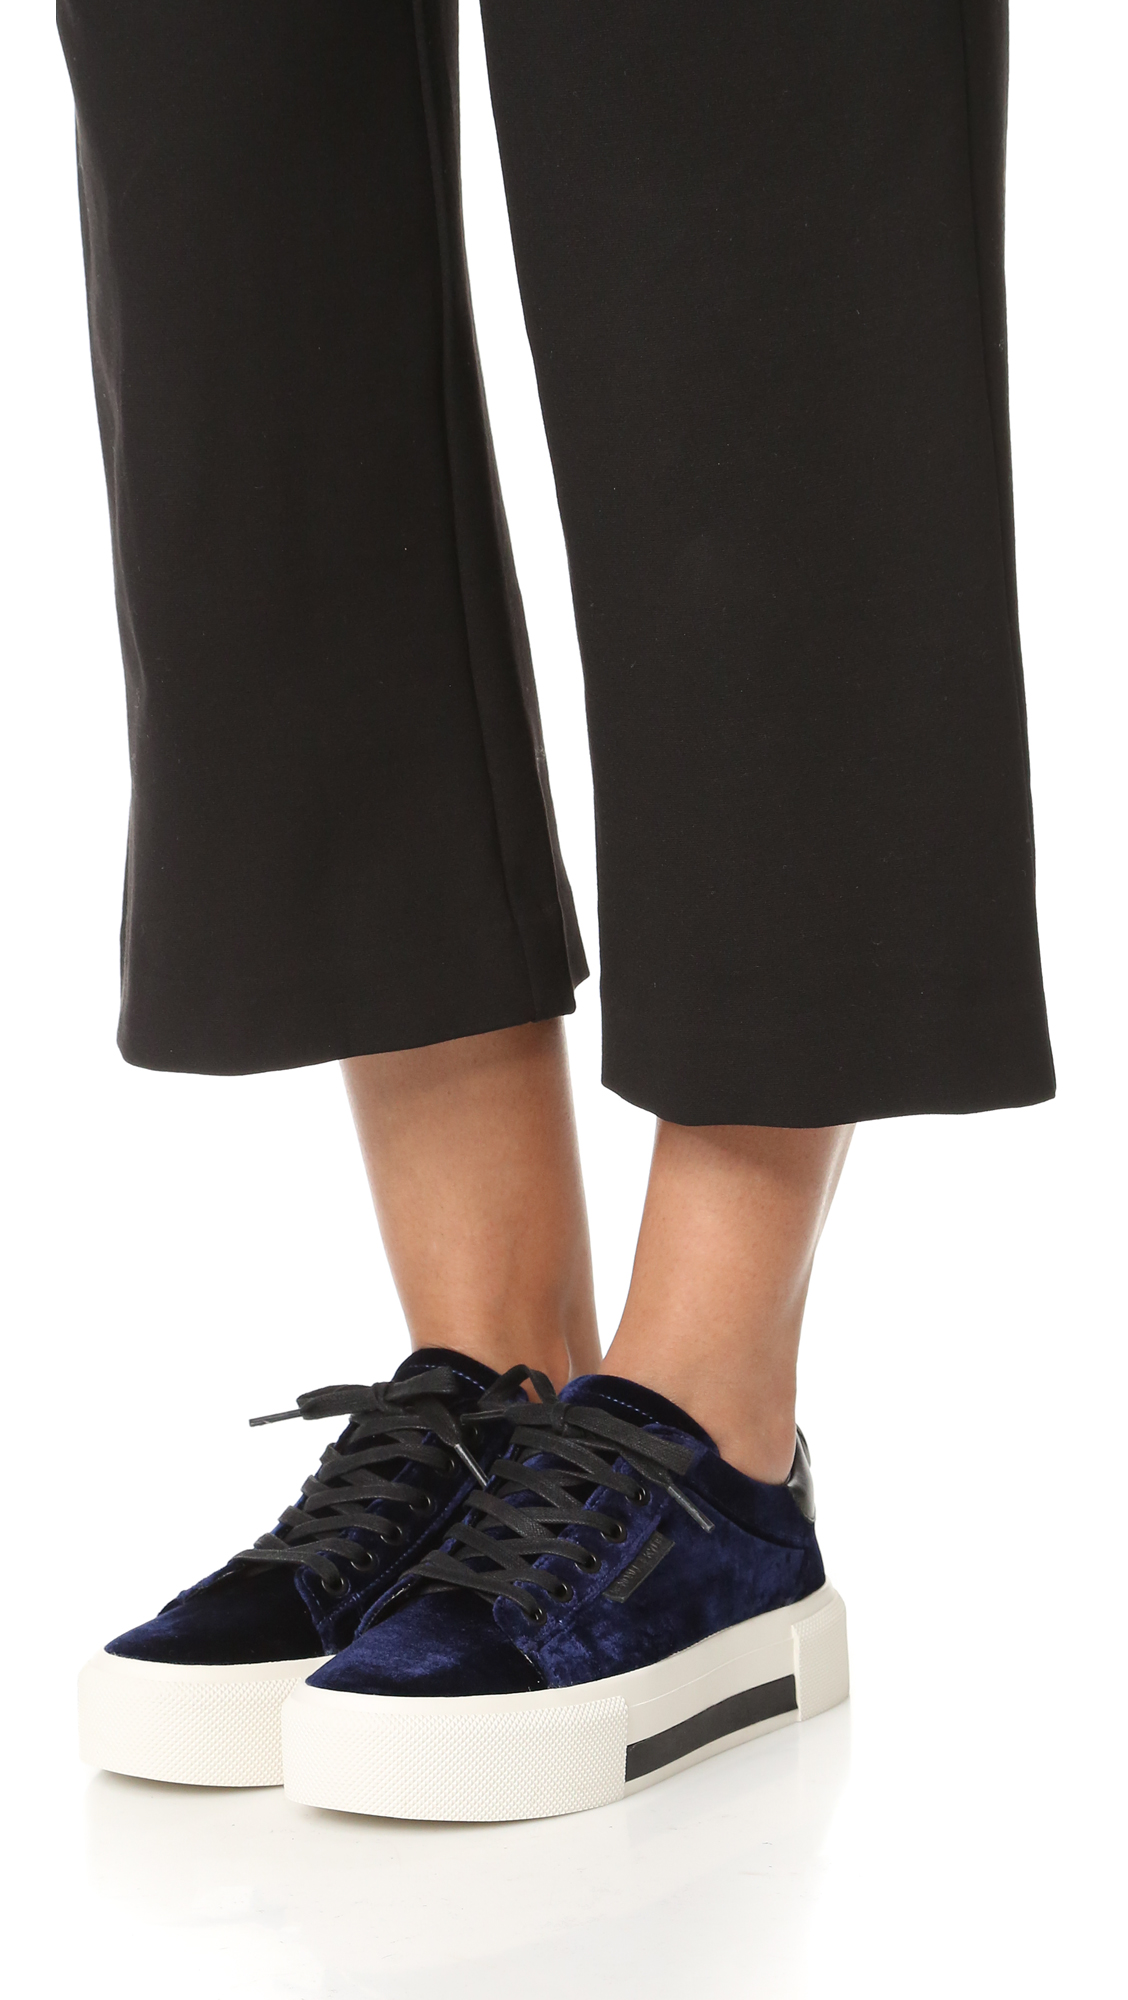 buy cheap footlocker pictures Kendall+Kylie Tyler platform sneakers sale newest top quality K71TdjnkY2